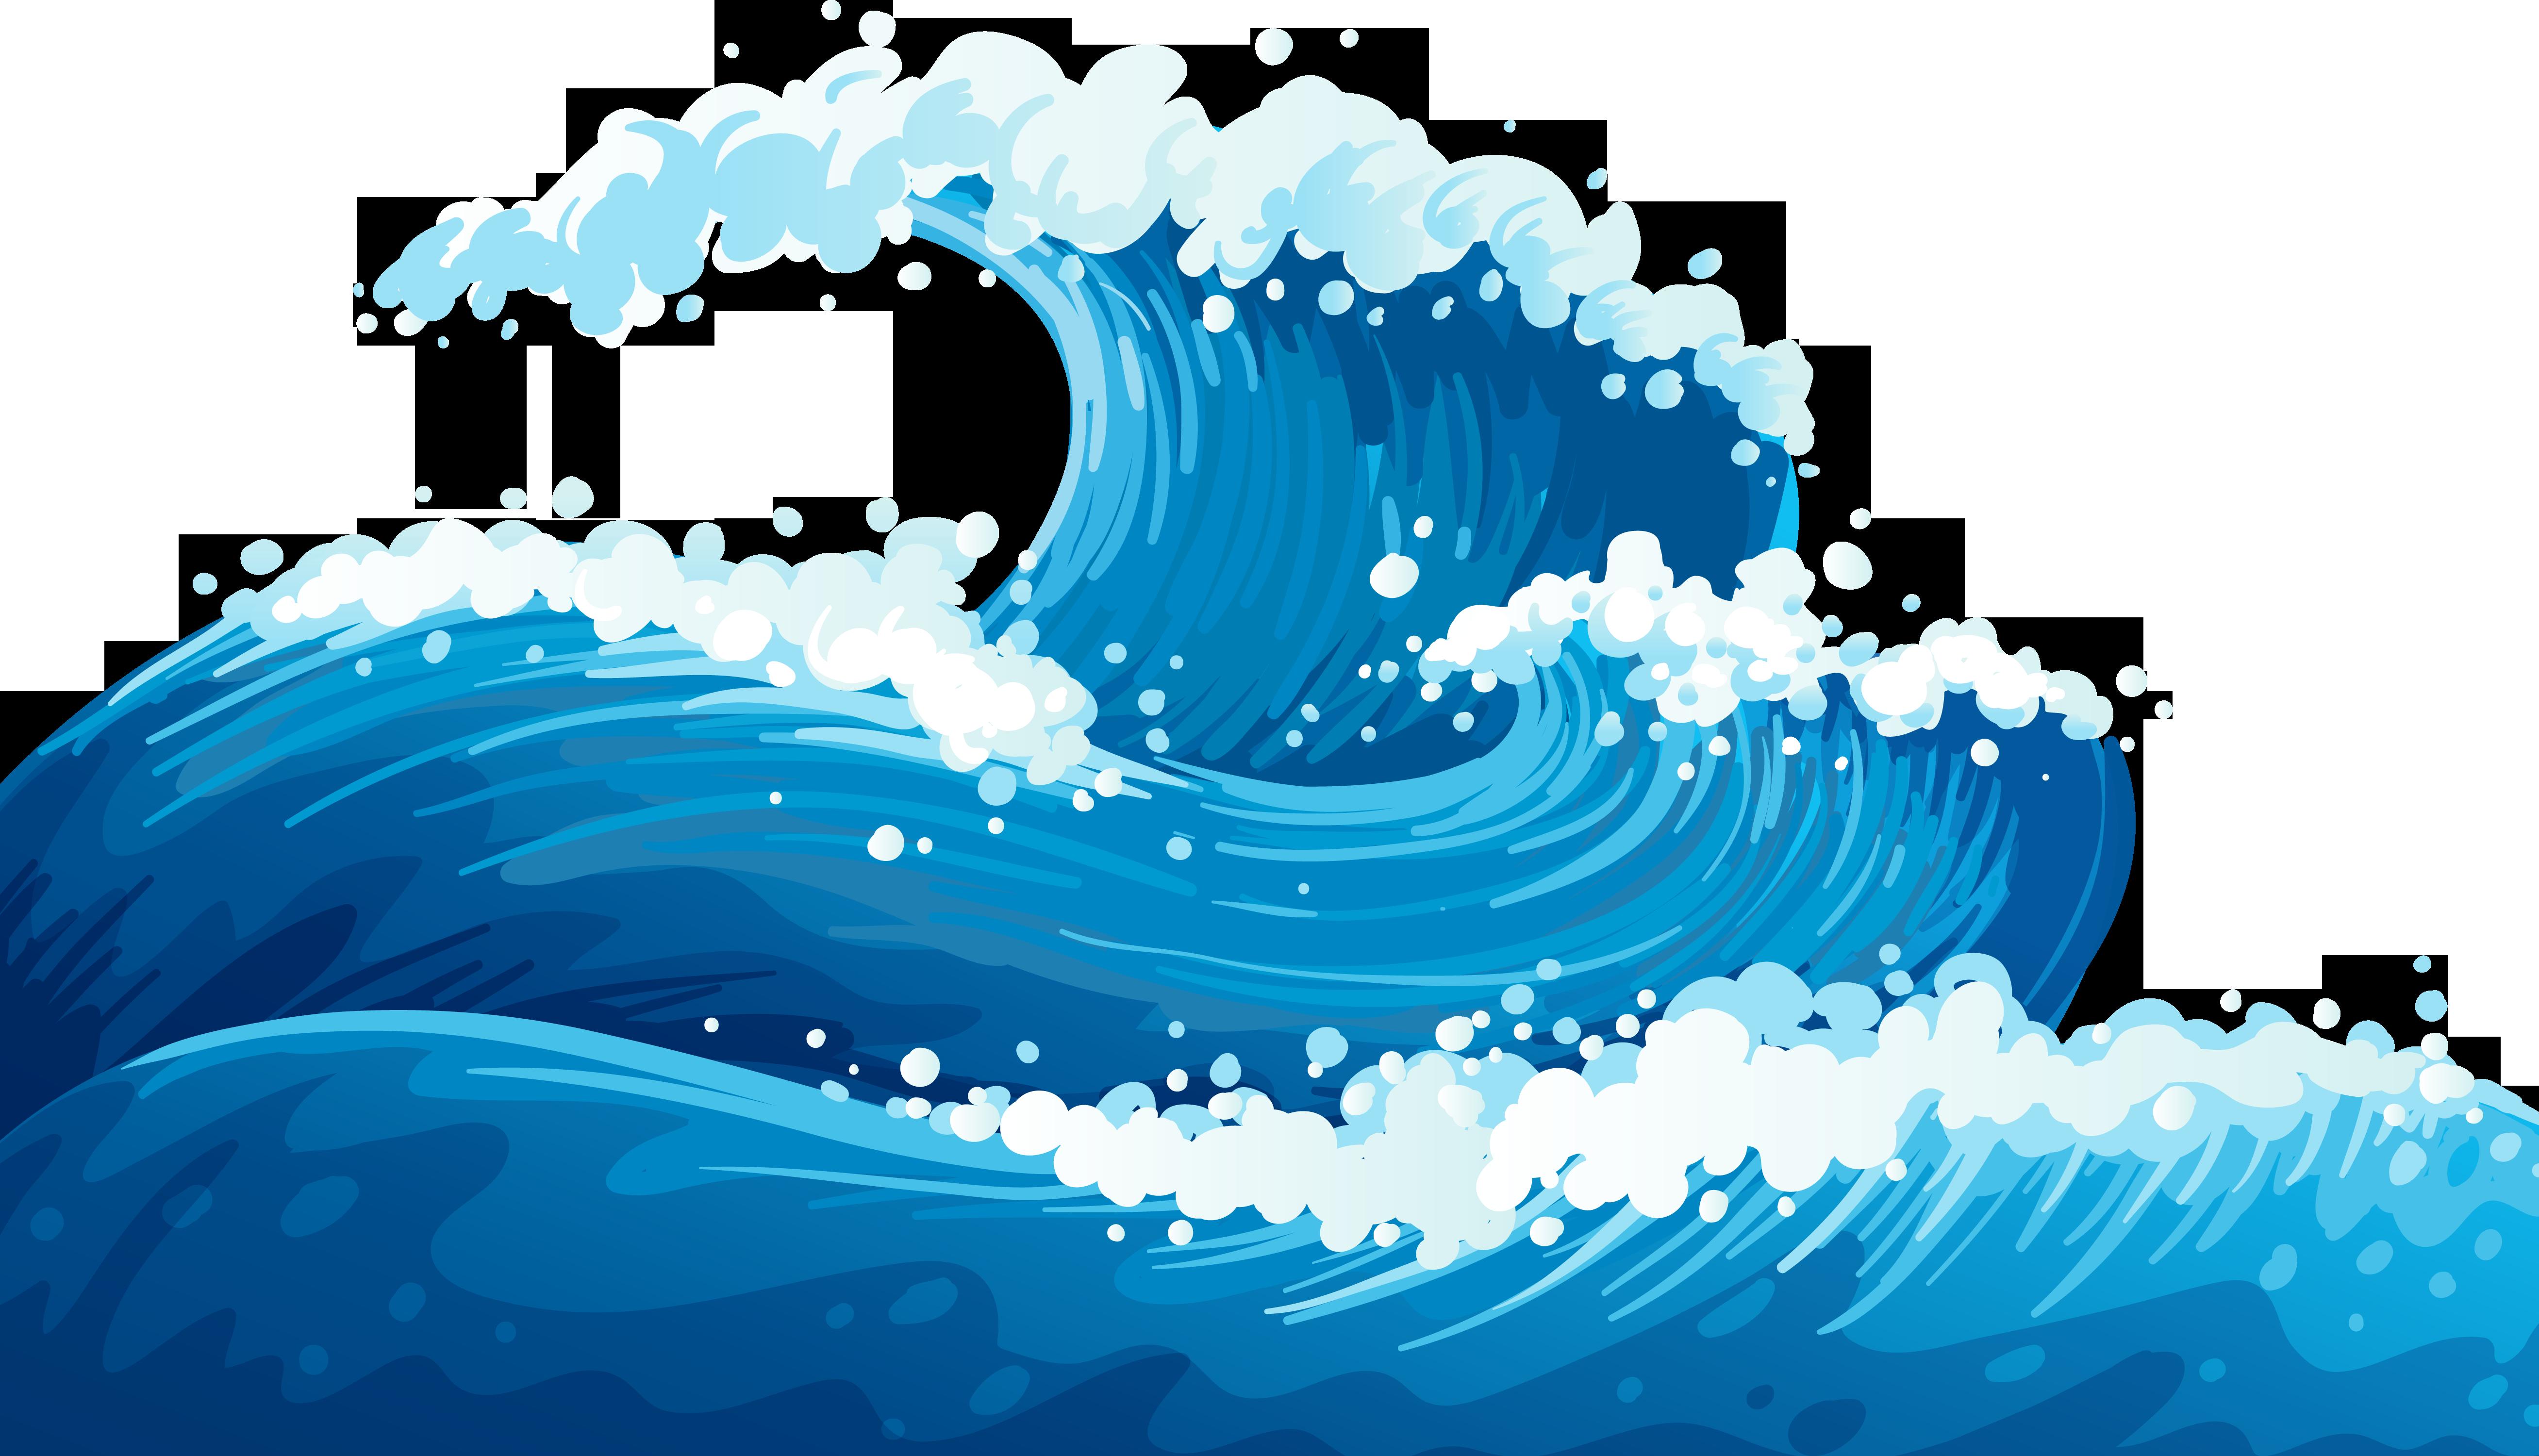 Pin By Lyudmila On Kartinki Detyam Ocean Wave Drawing Sea Illustration Wave Illustration